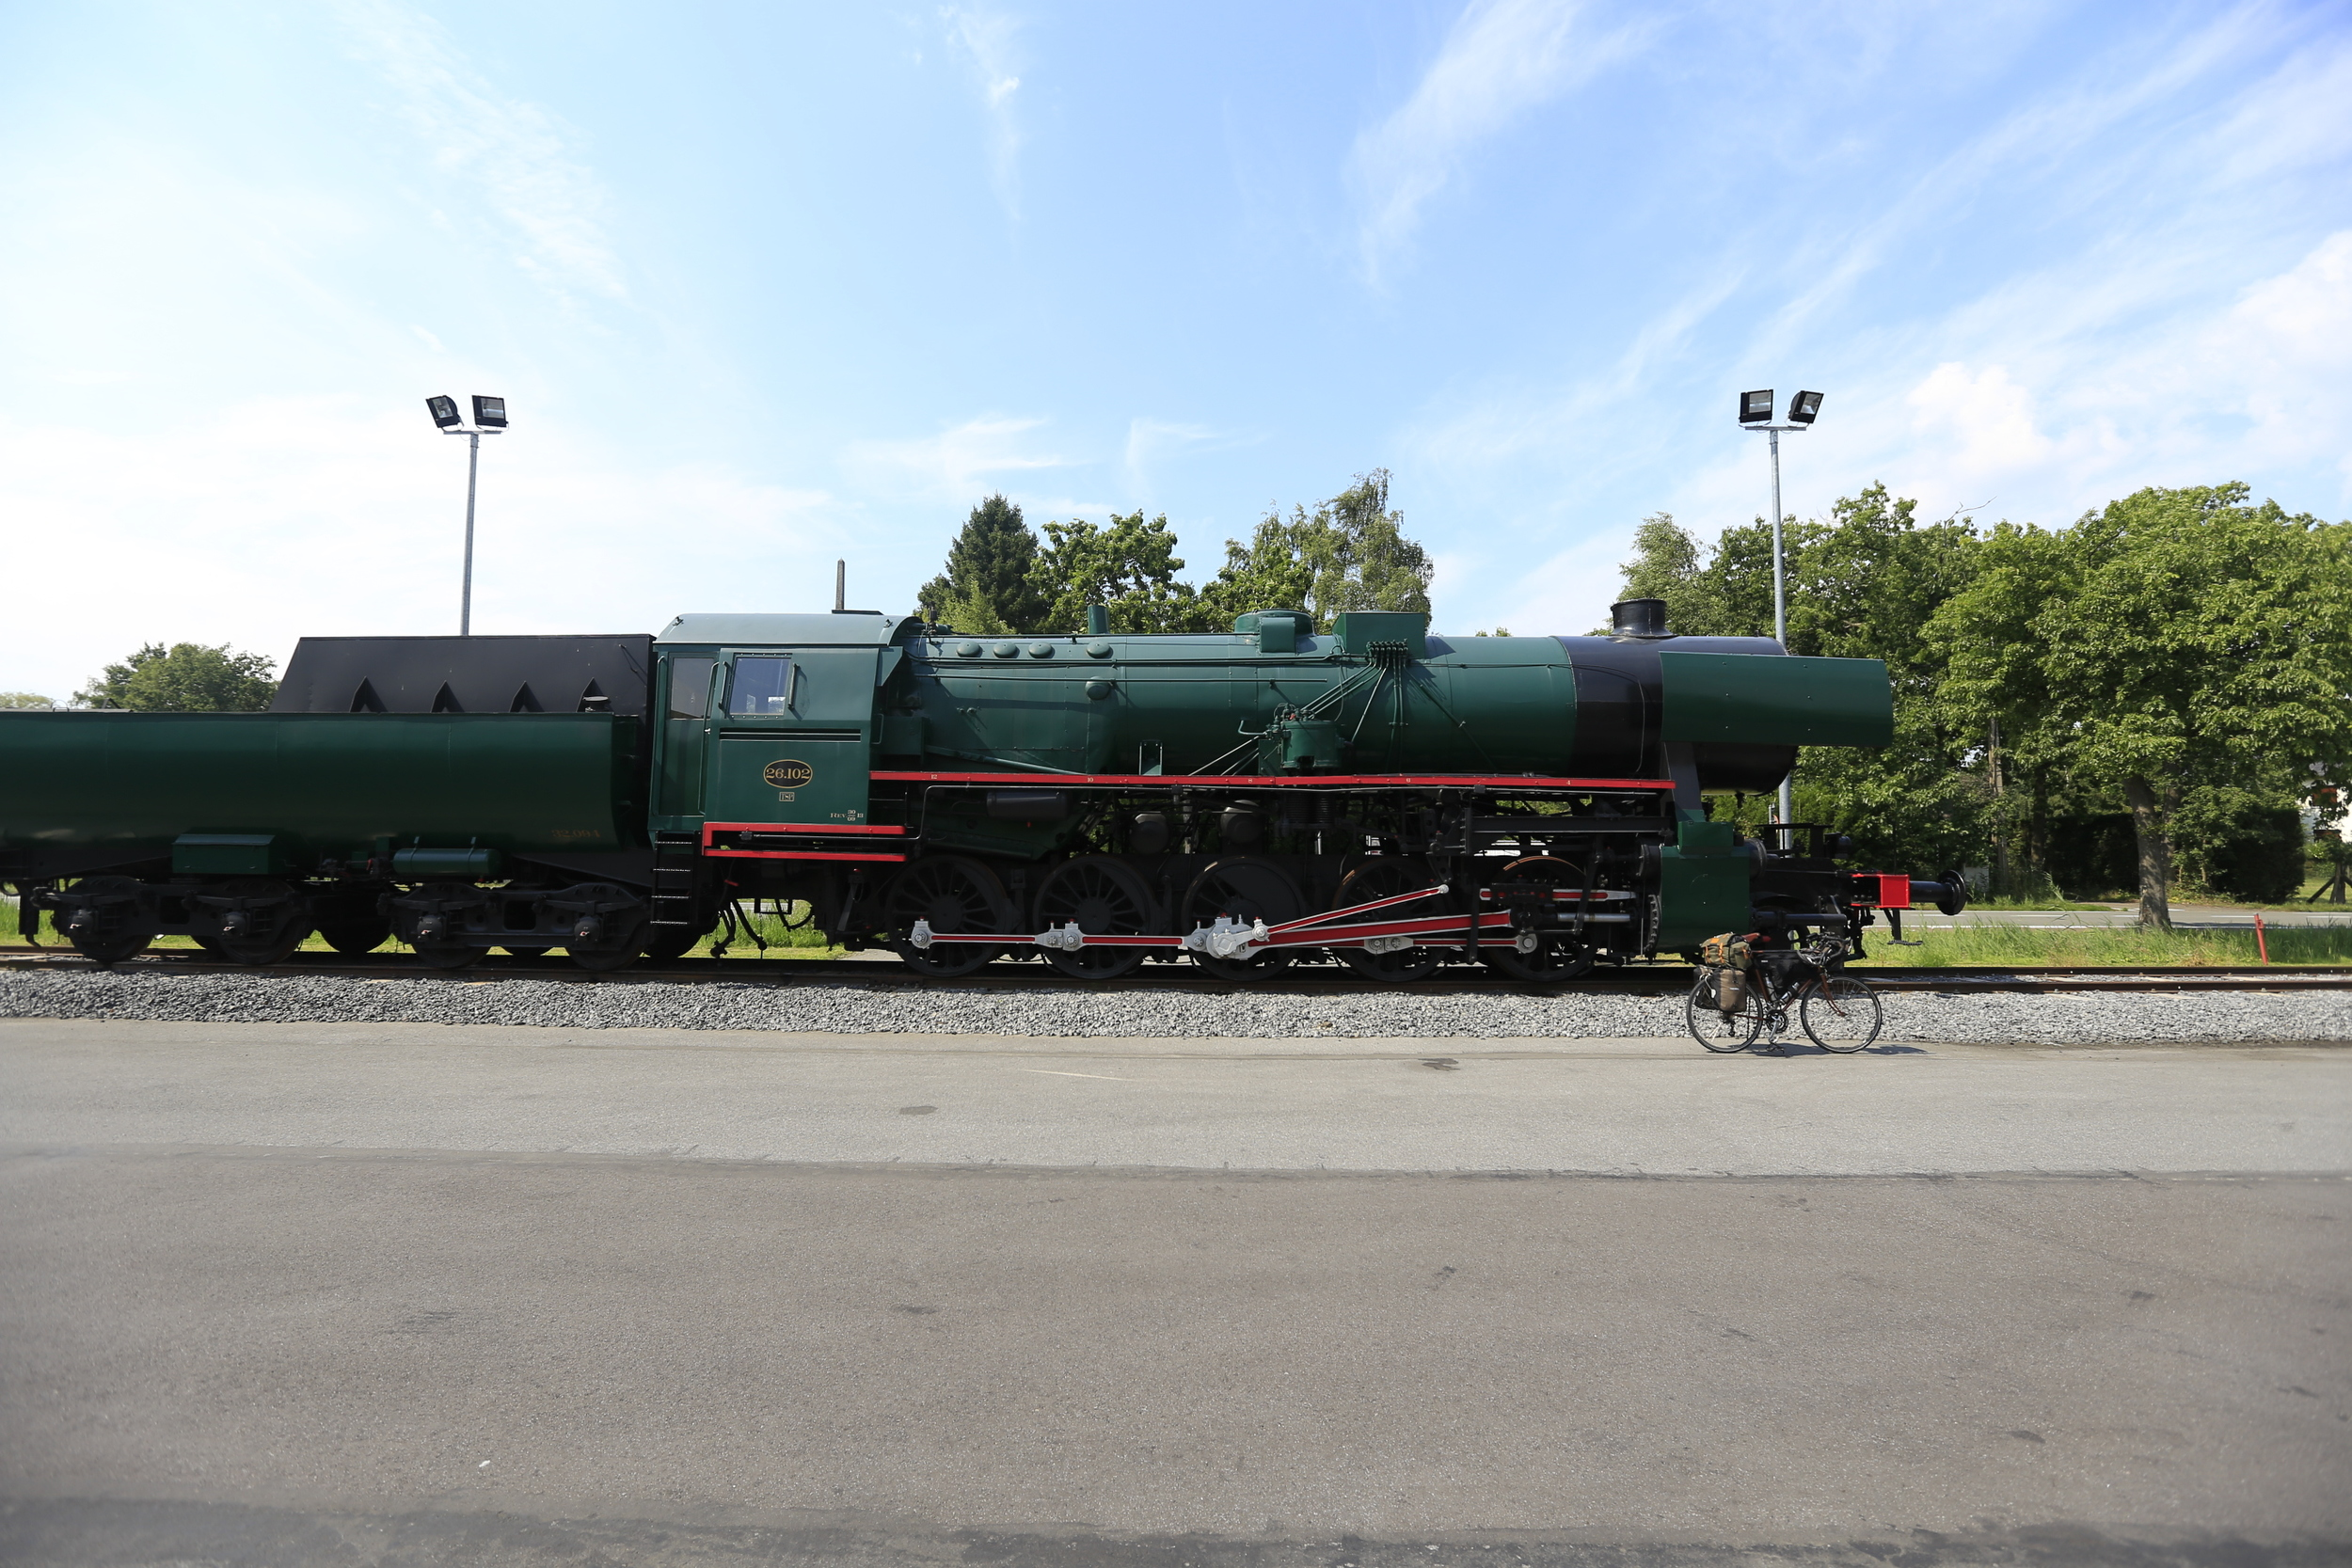 steam train, train, locomotive, photo, canon, canon 6d, ef 16-35mm, landscape photography, visit belgium, explore, cycling, ride